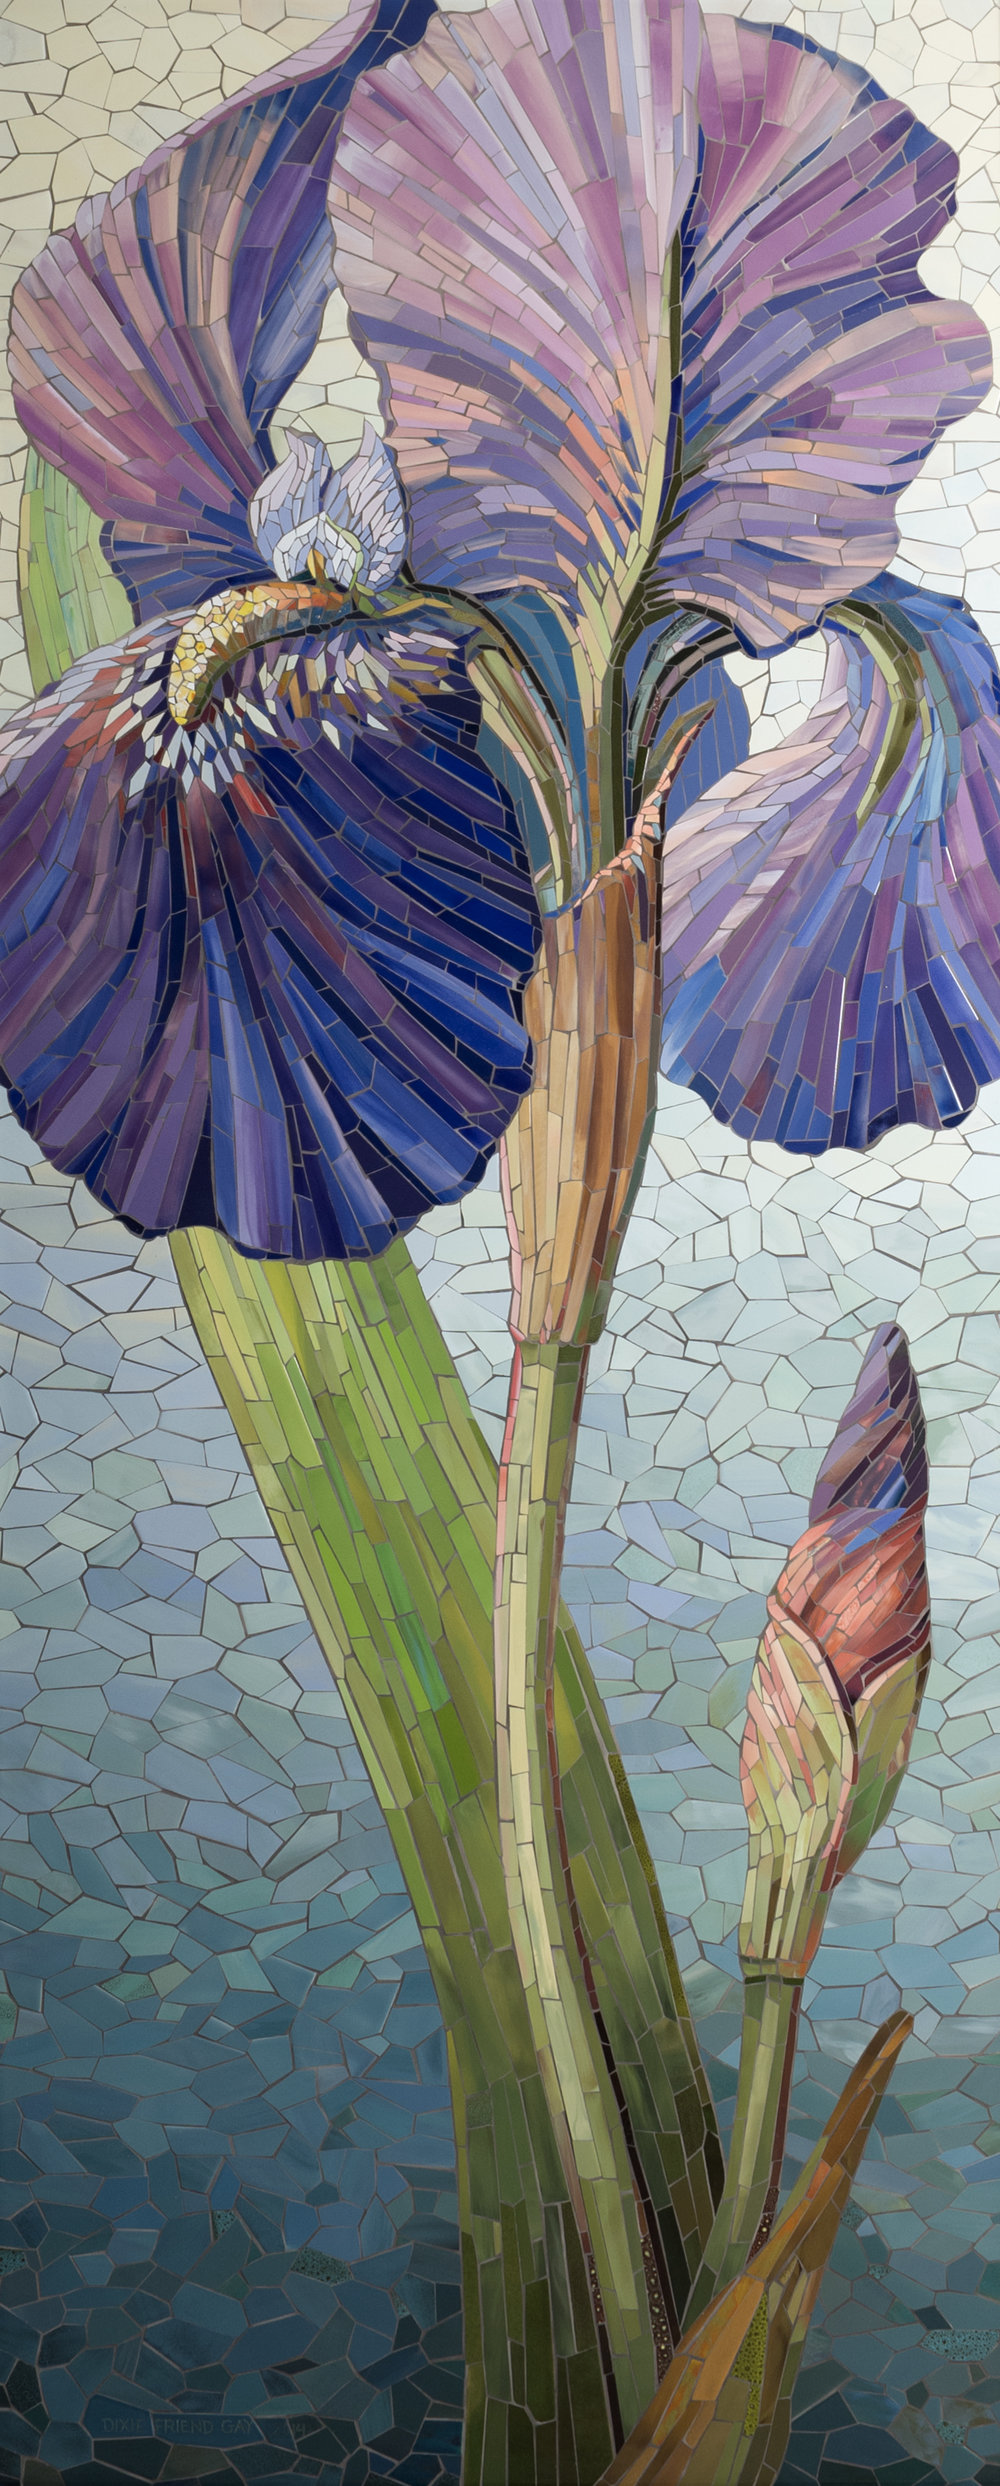 Iris by Hall.jpg